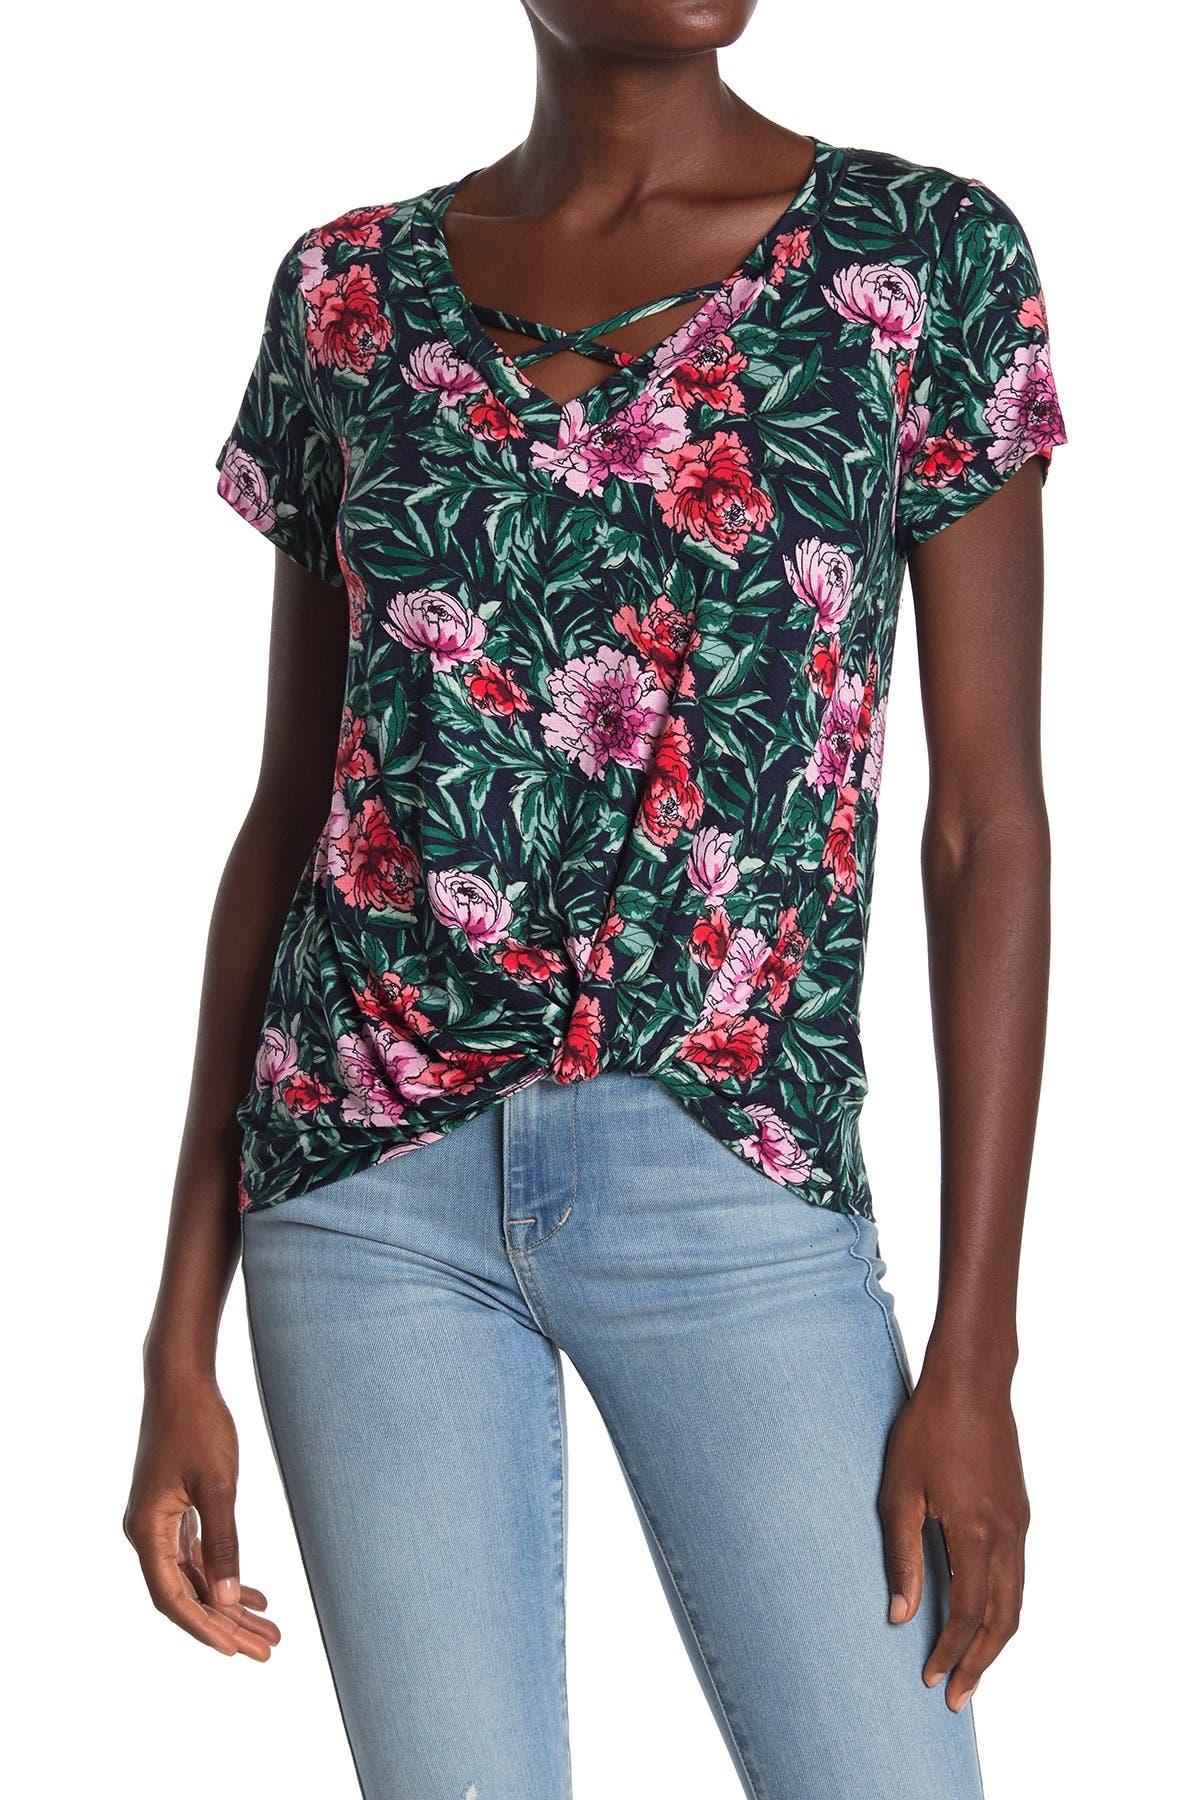 Bobeau Womens Martha Navy Off-The-Shoulder Pullover Top Shirt M BHFO 3721